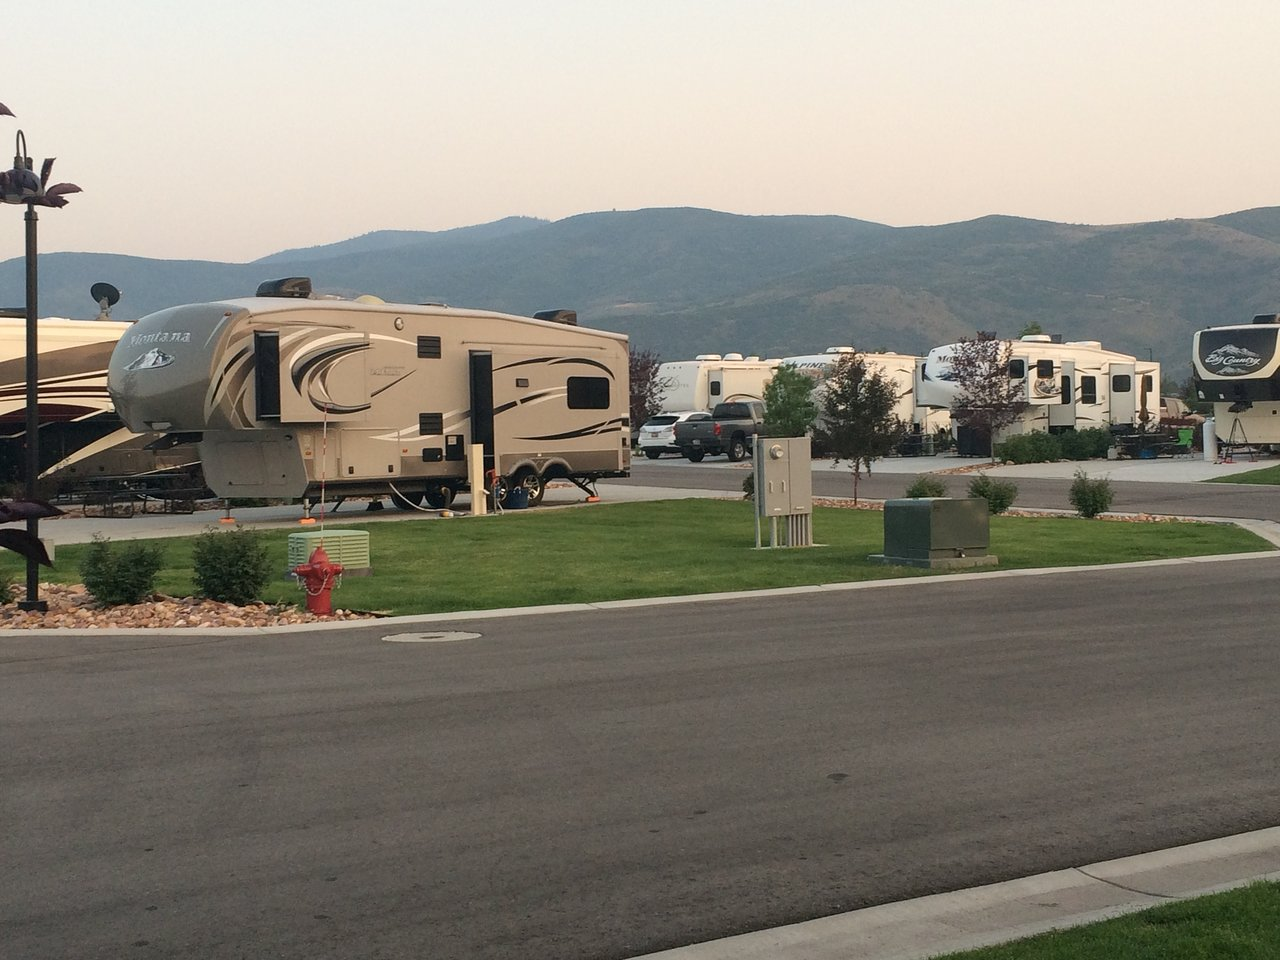 mountain valley rv resort - campground reviews (heber city, utah